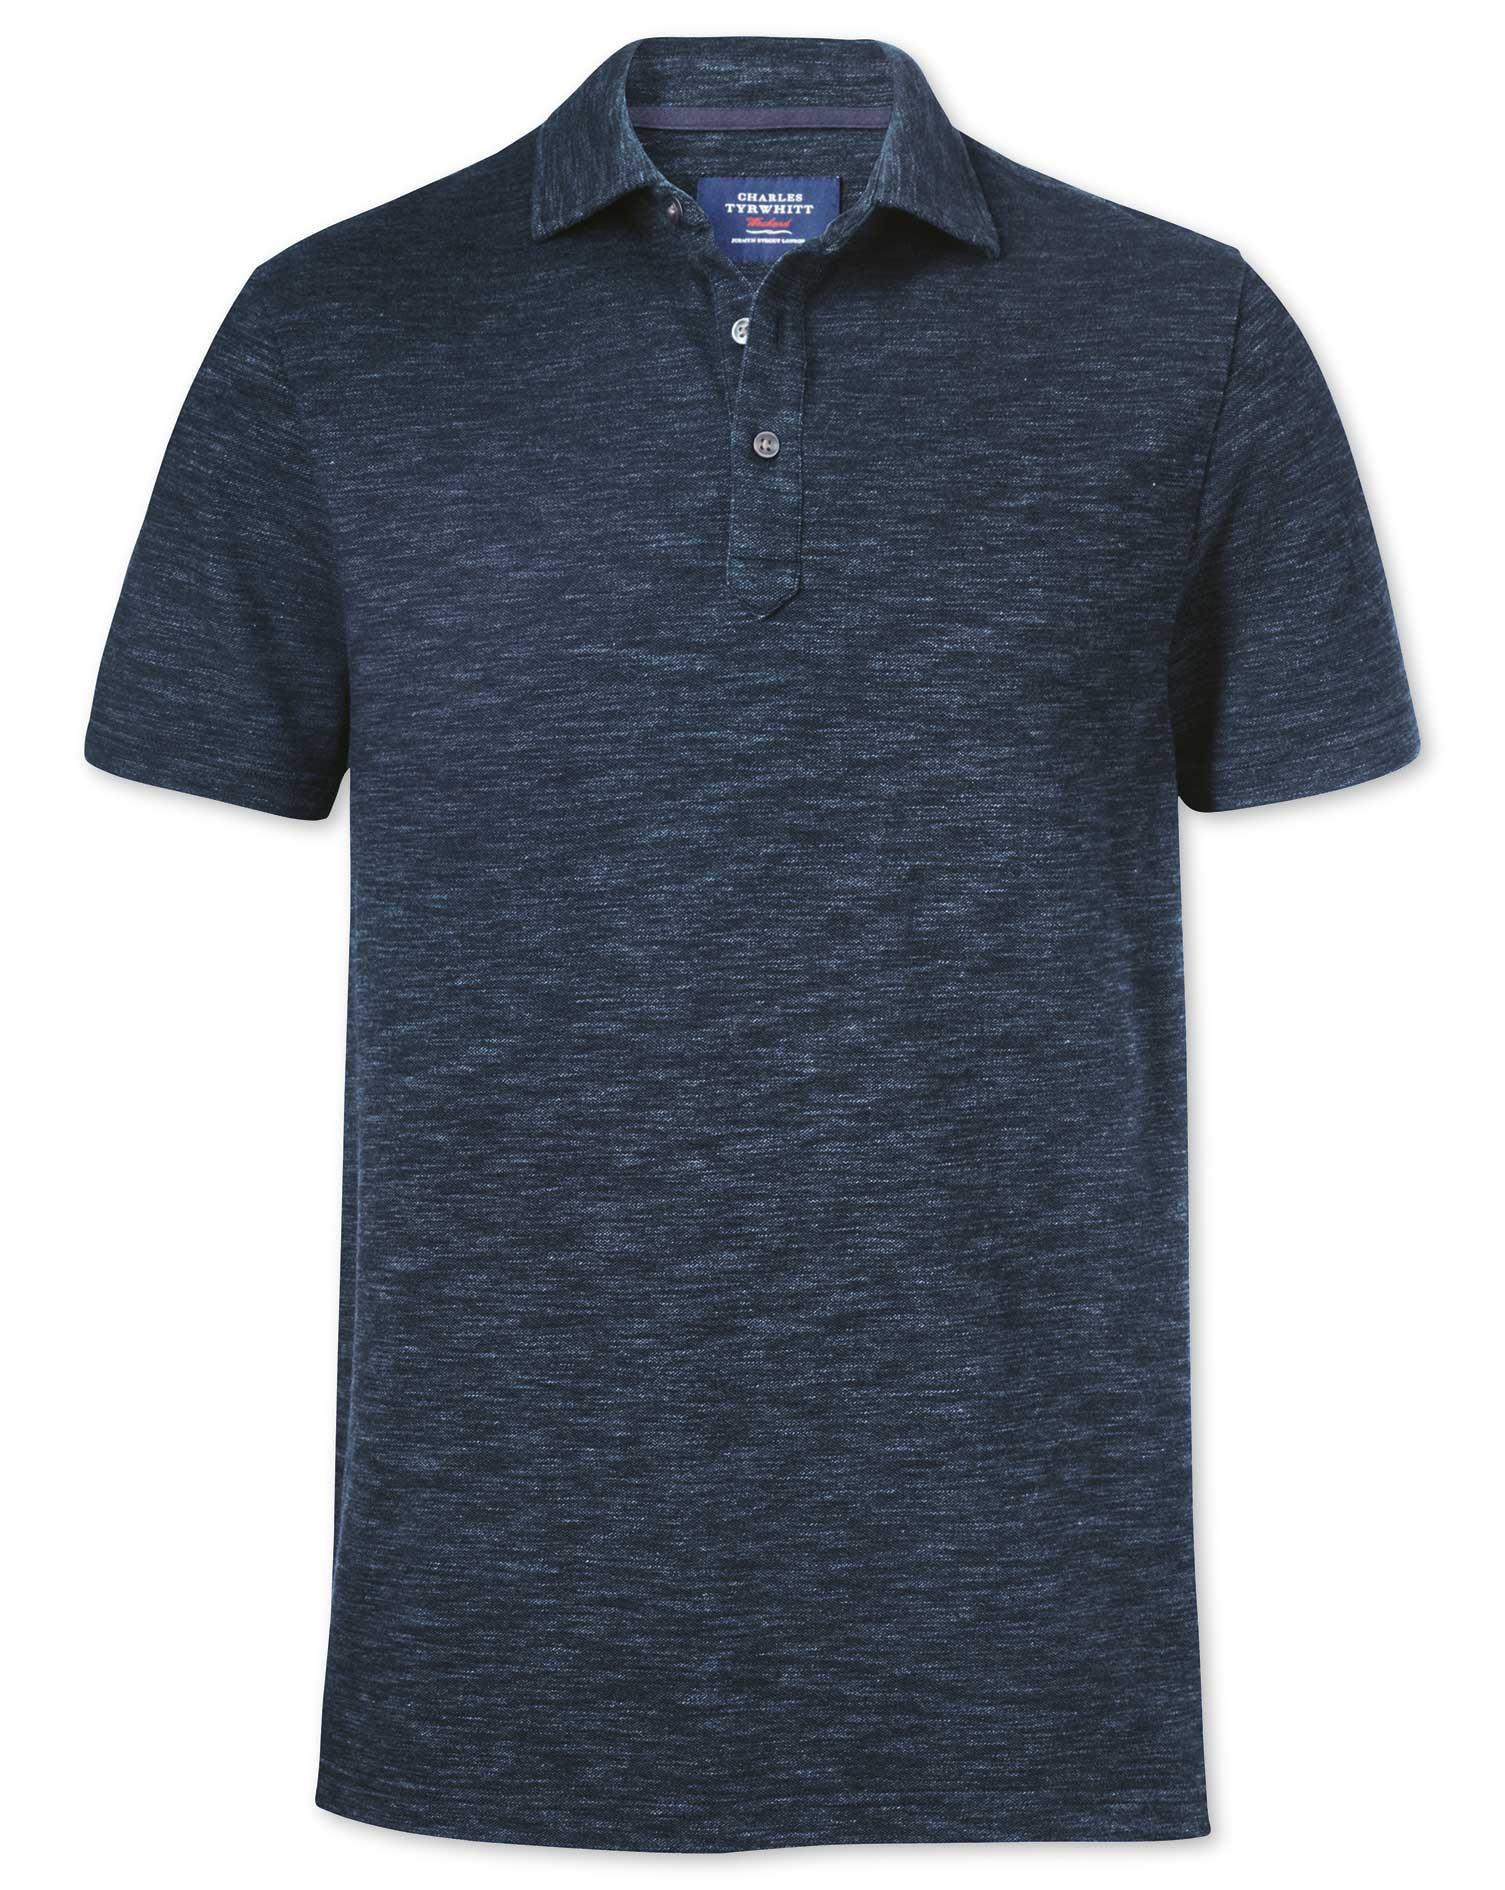 Denim Blue Cotton Polo Size XL by Charles Tyrwhitt